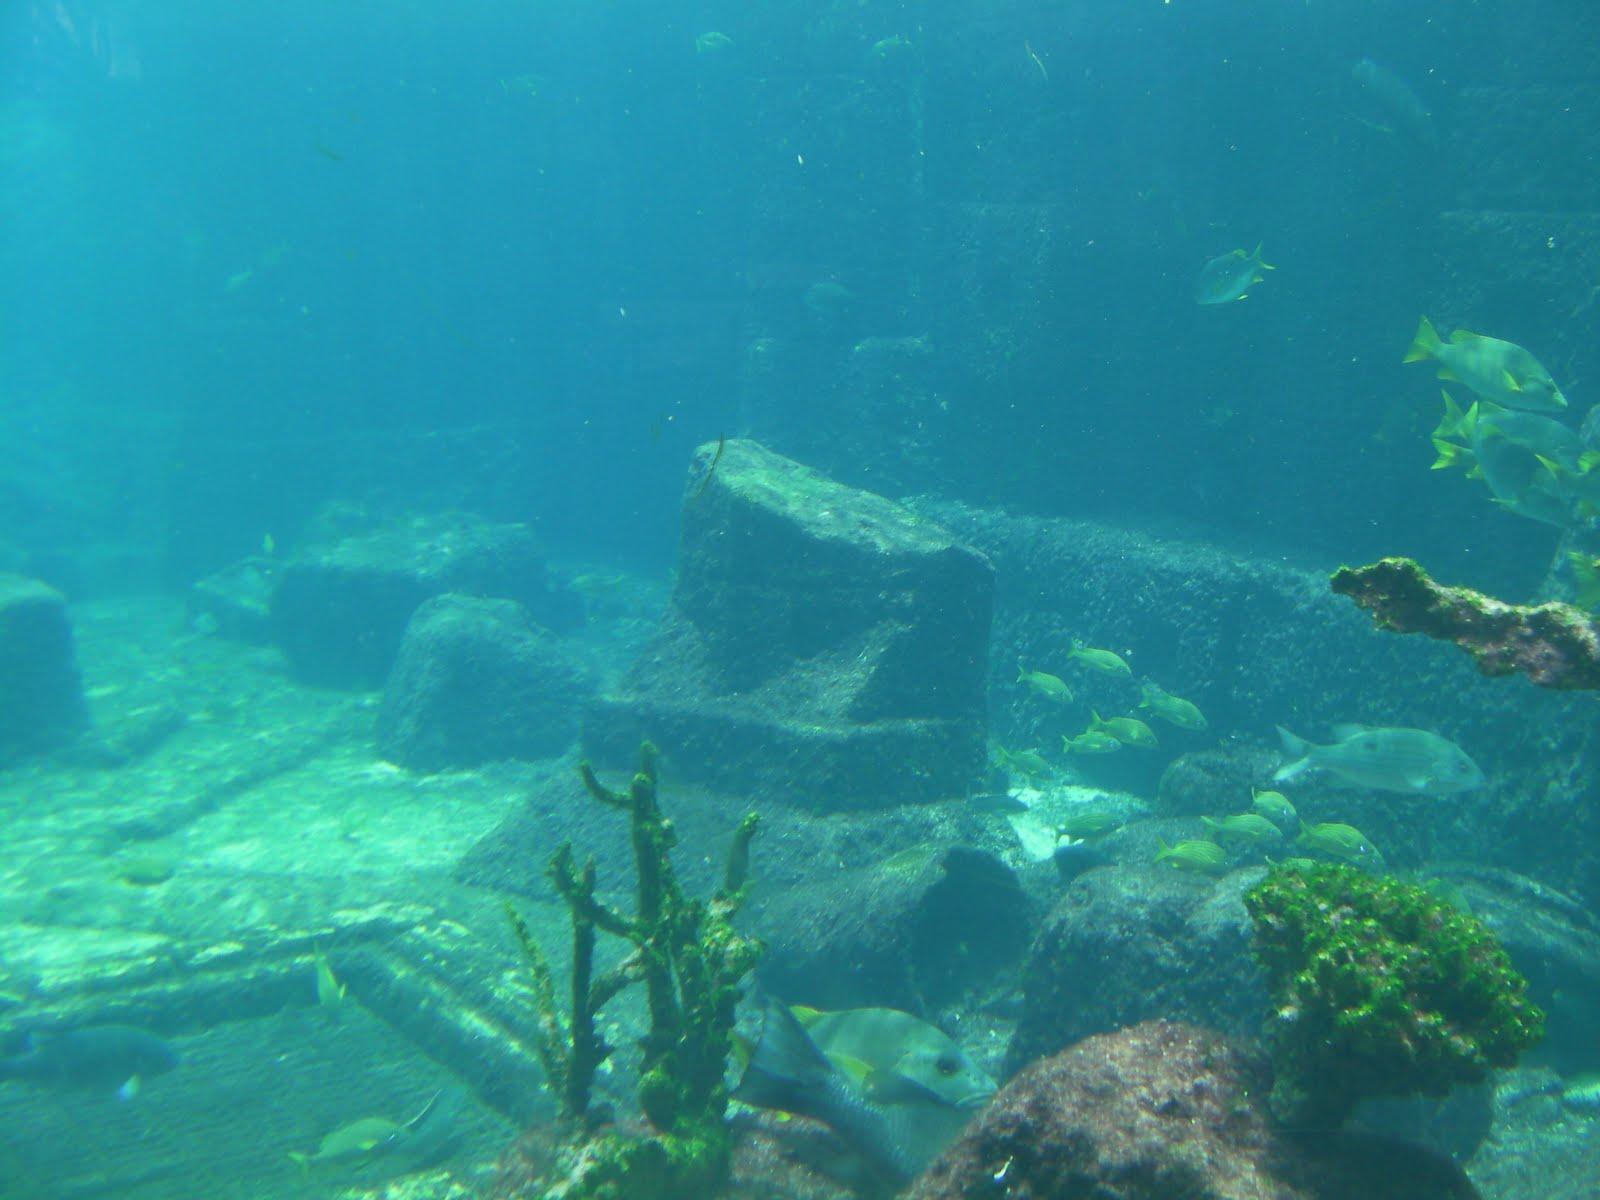 Number One London: Snorkeling the Atlantis Ruins